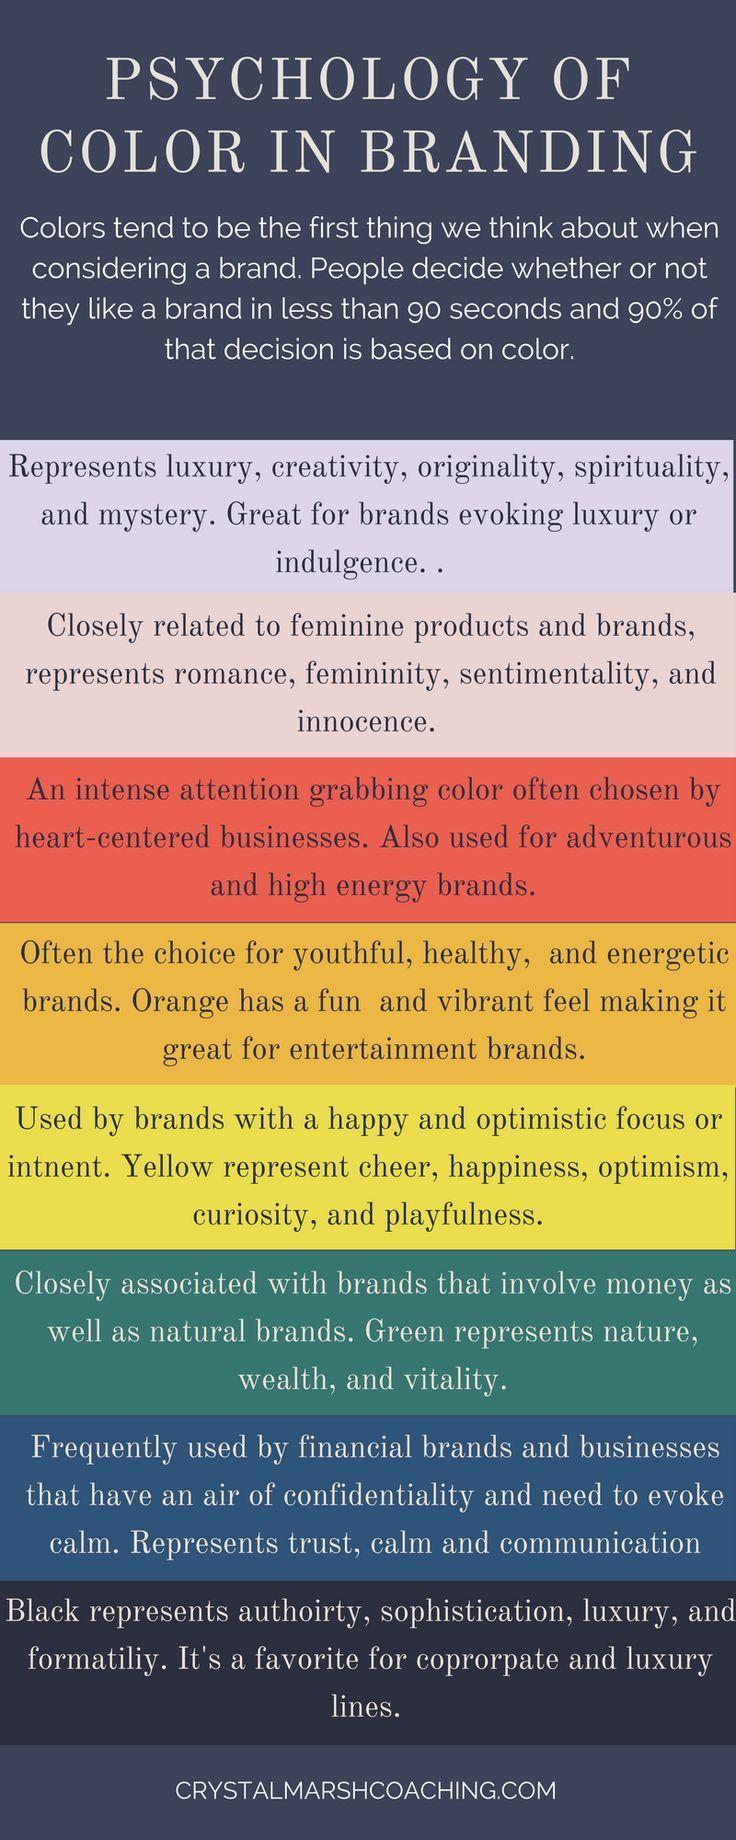 branding, branding colors, branding color psychology, branding schemes, branding colour palette, branding colors mood boards, branding colors inspiration, branding colors business